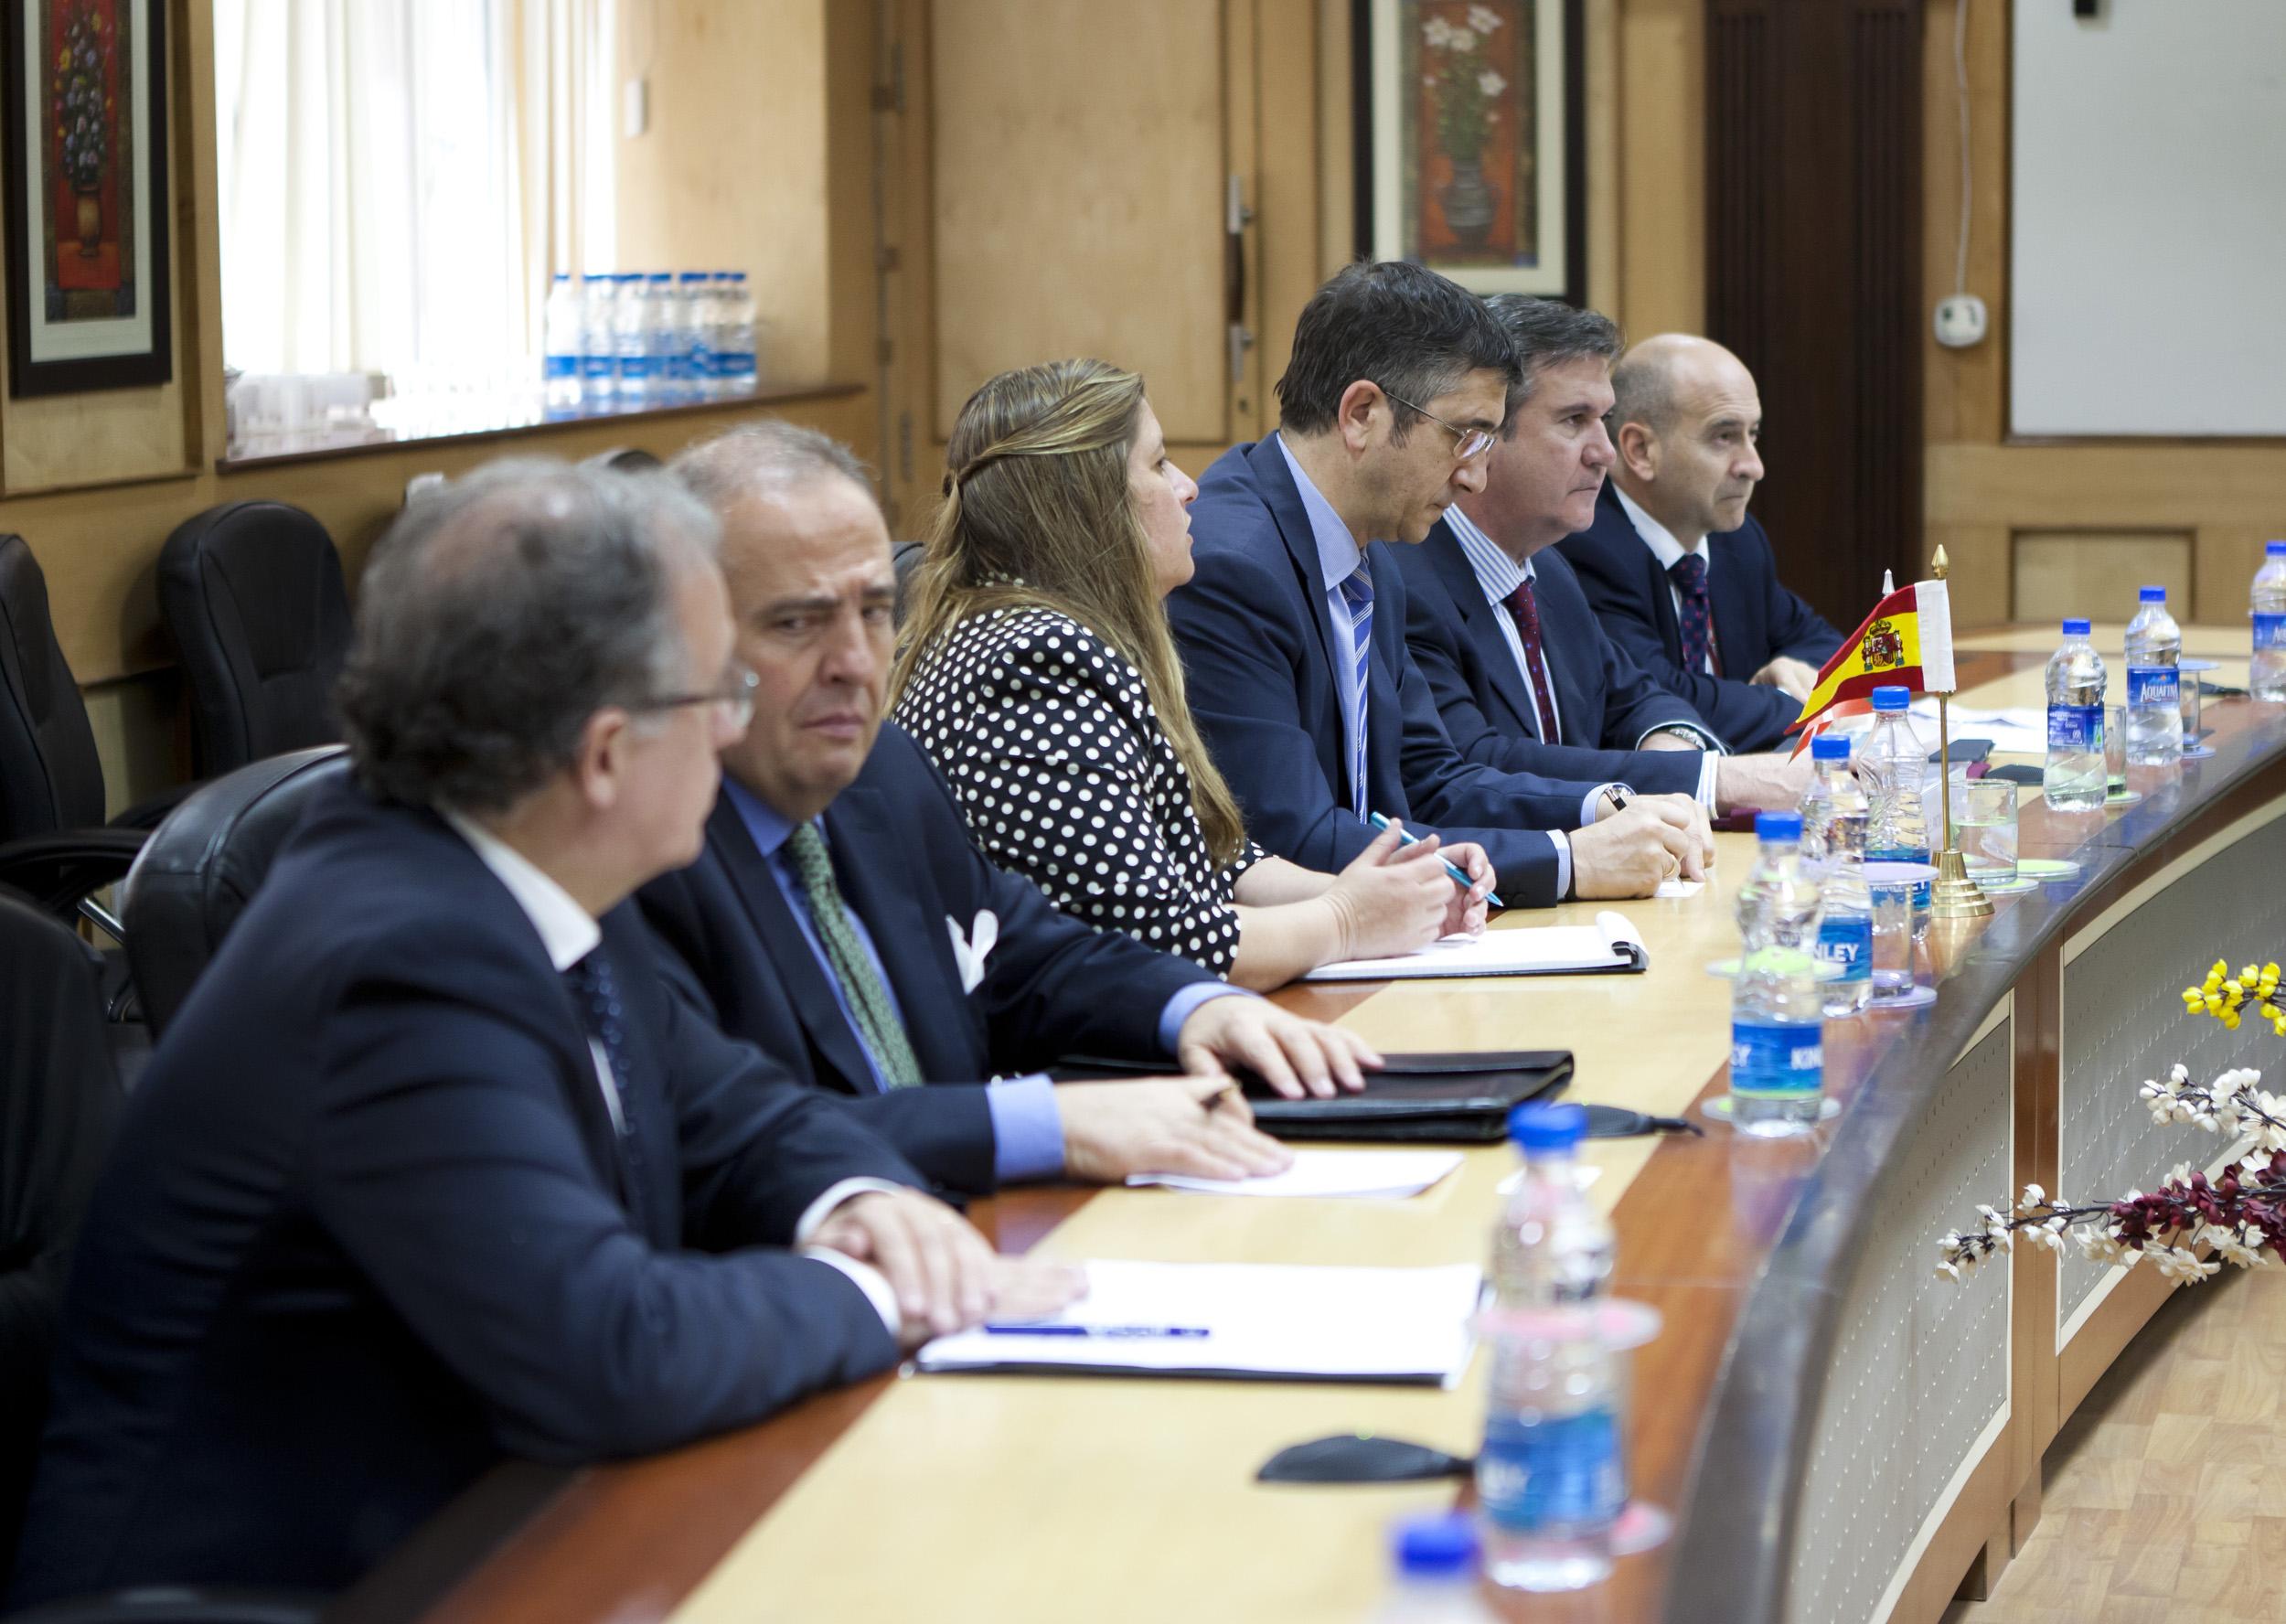 2012_03_21_lehendakari_ministro5_ciencia.jpg